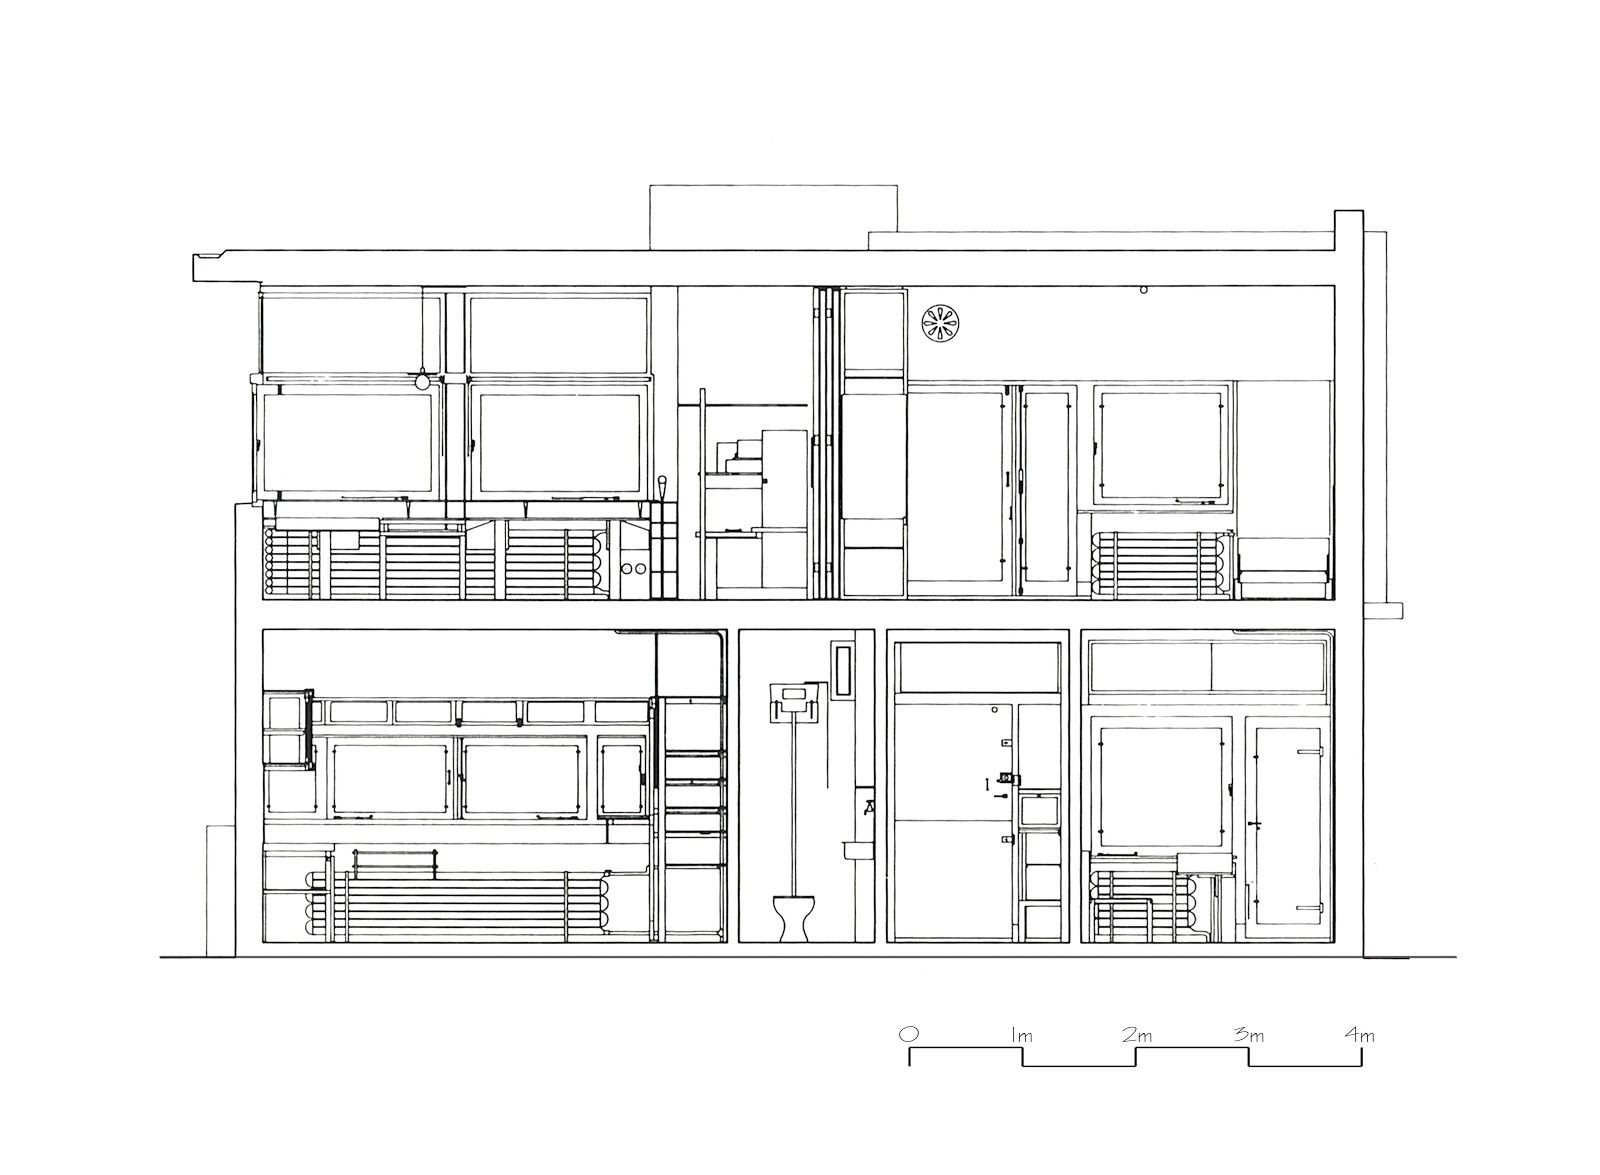 Schroder house plan section elevation